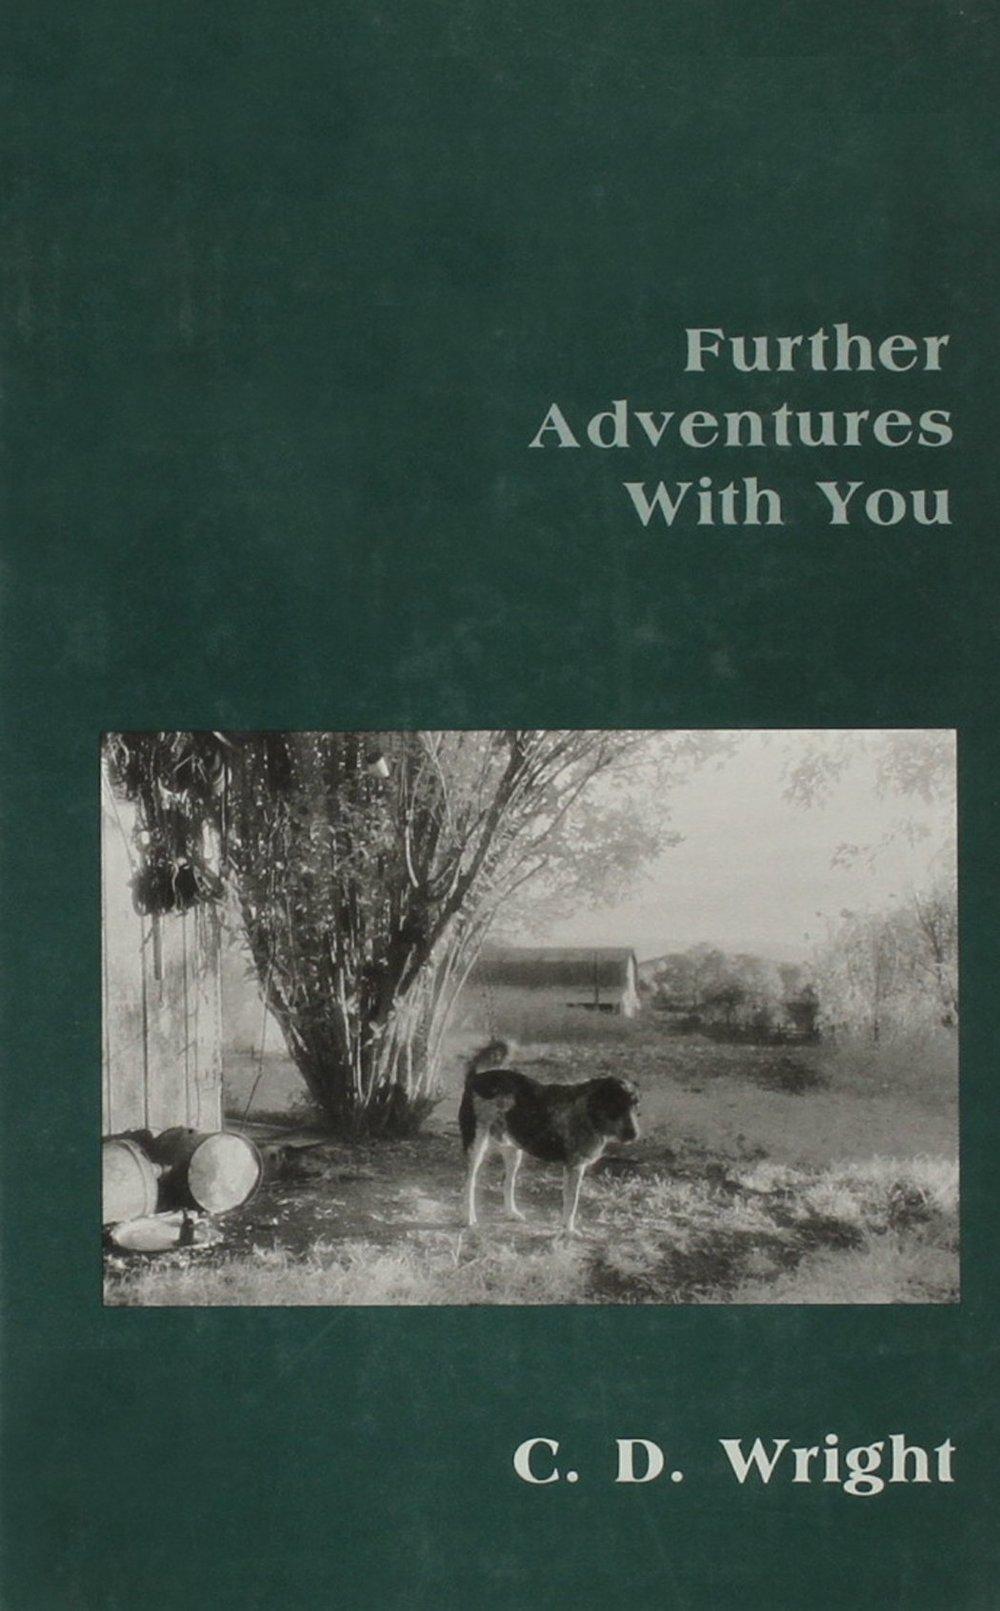 13-further-adventures.jpg